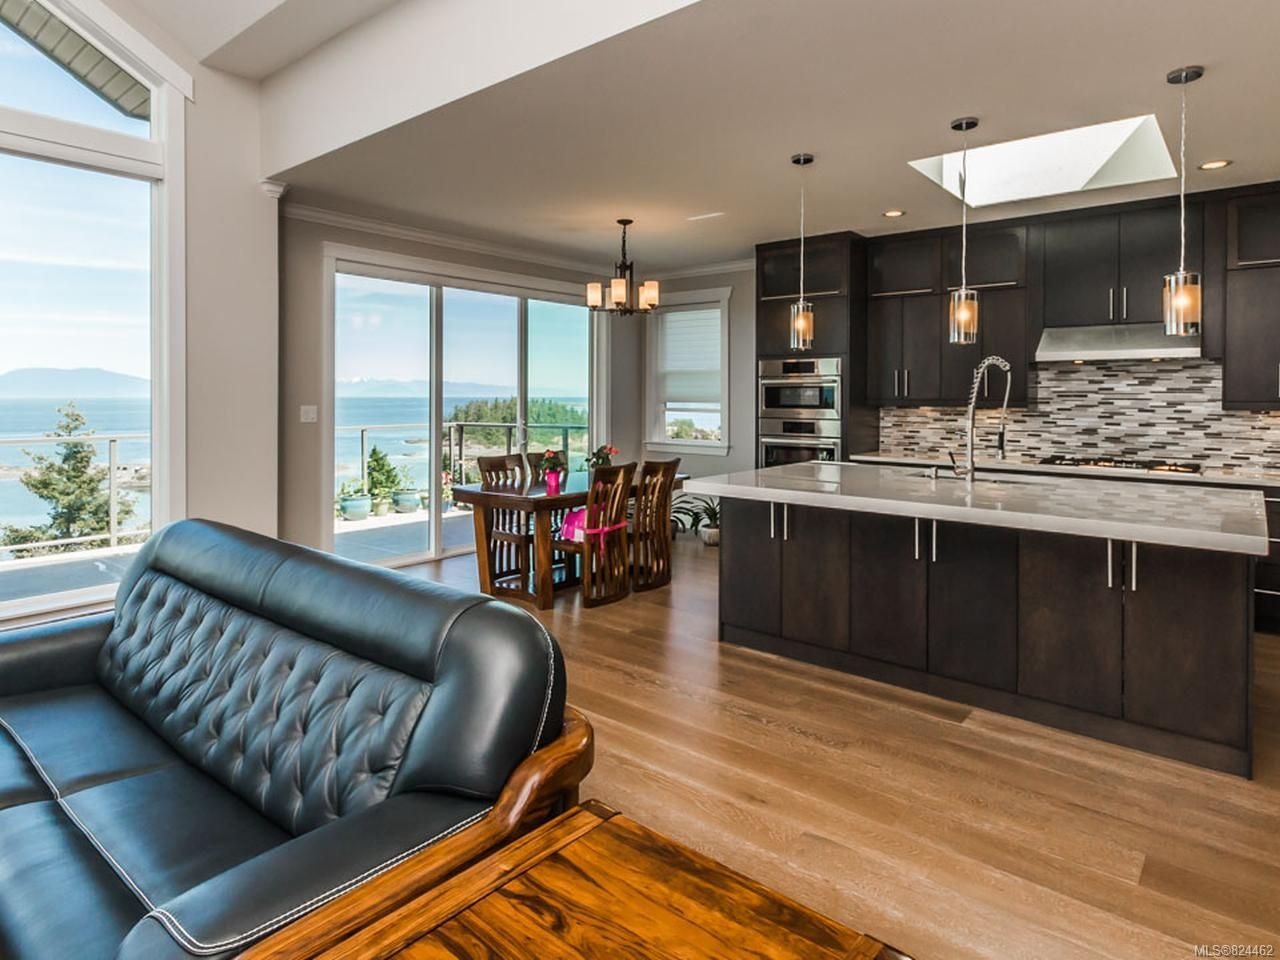 Photo 3: Photos: 3864 Gulfview Dr in NANAIMO: Na North Nanaimo House for sale (Nanaimo)  : MLS®# 824462